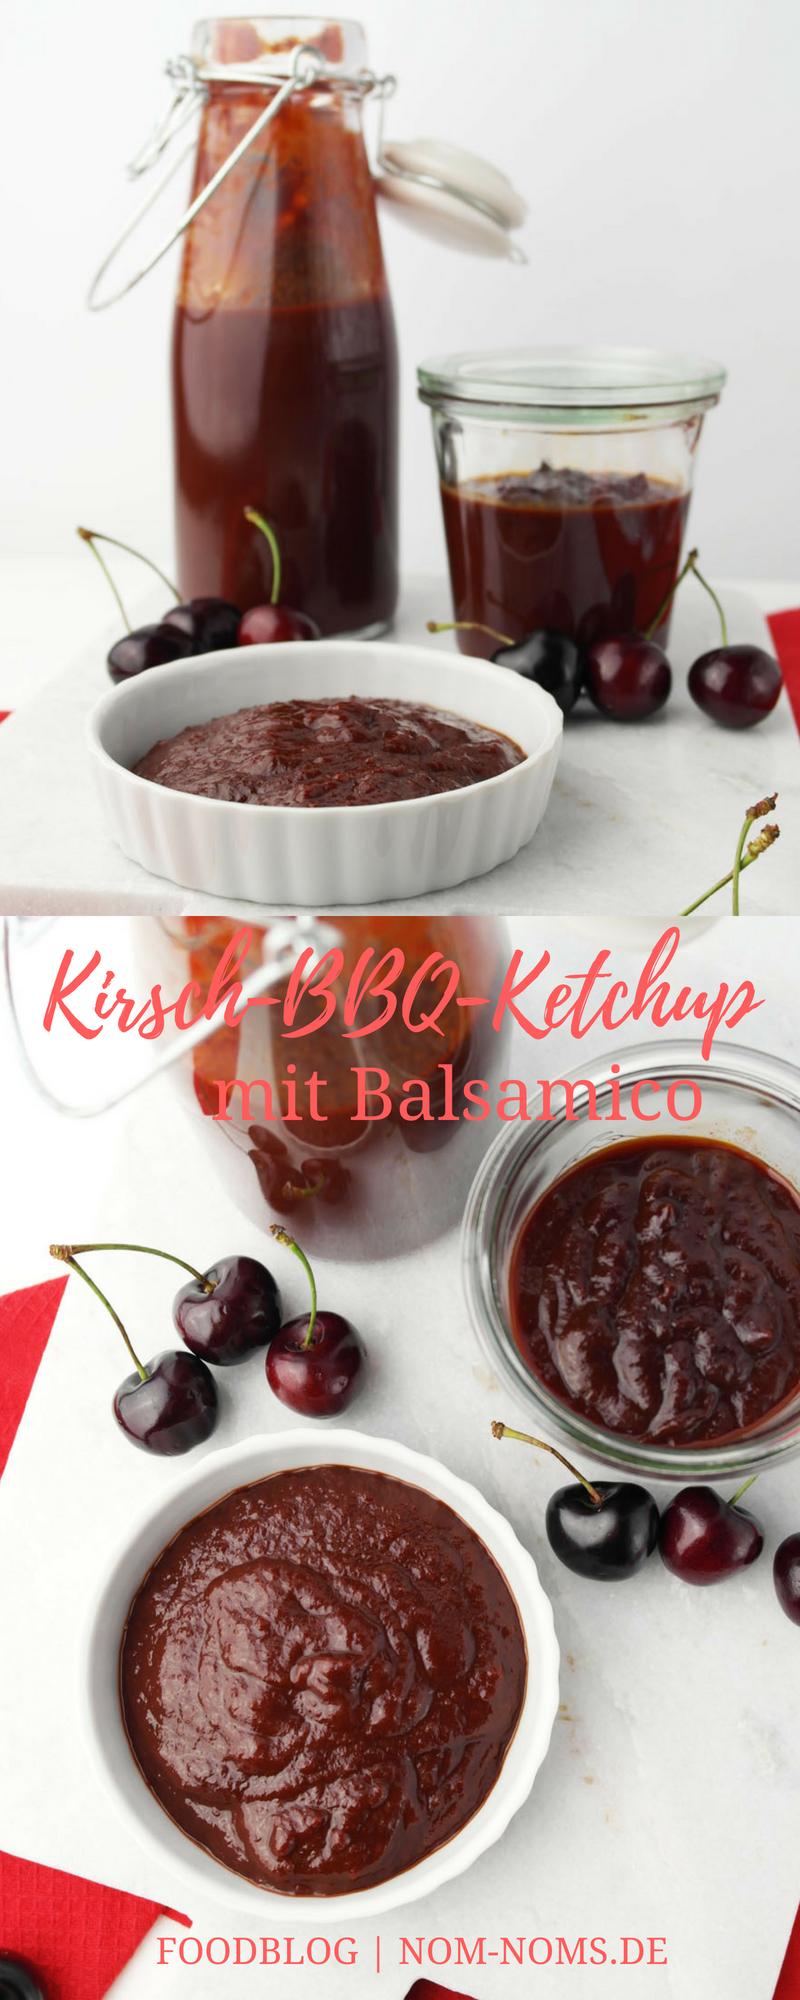 Kirsch-BBQ-Ketchup mit Balsamico vegan